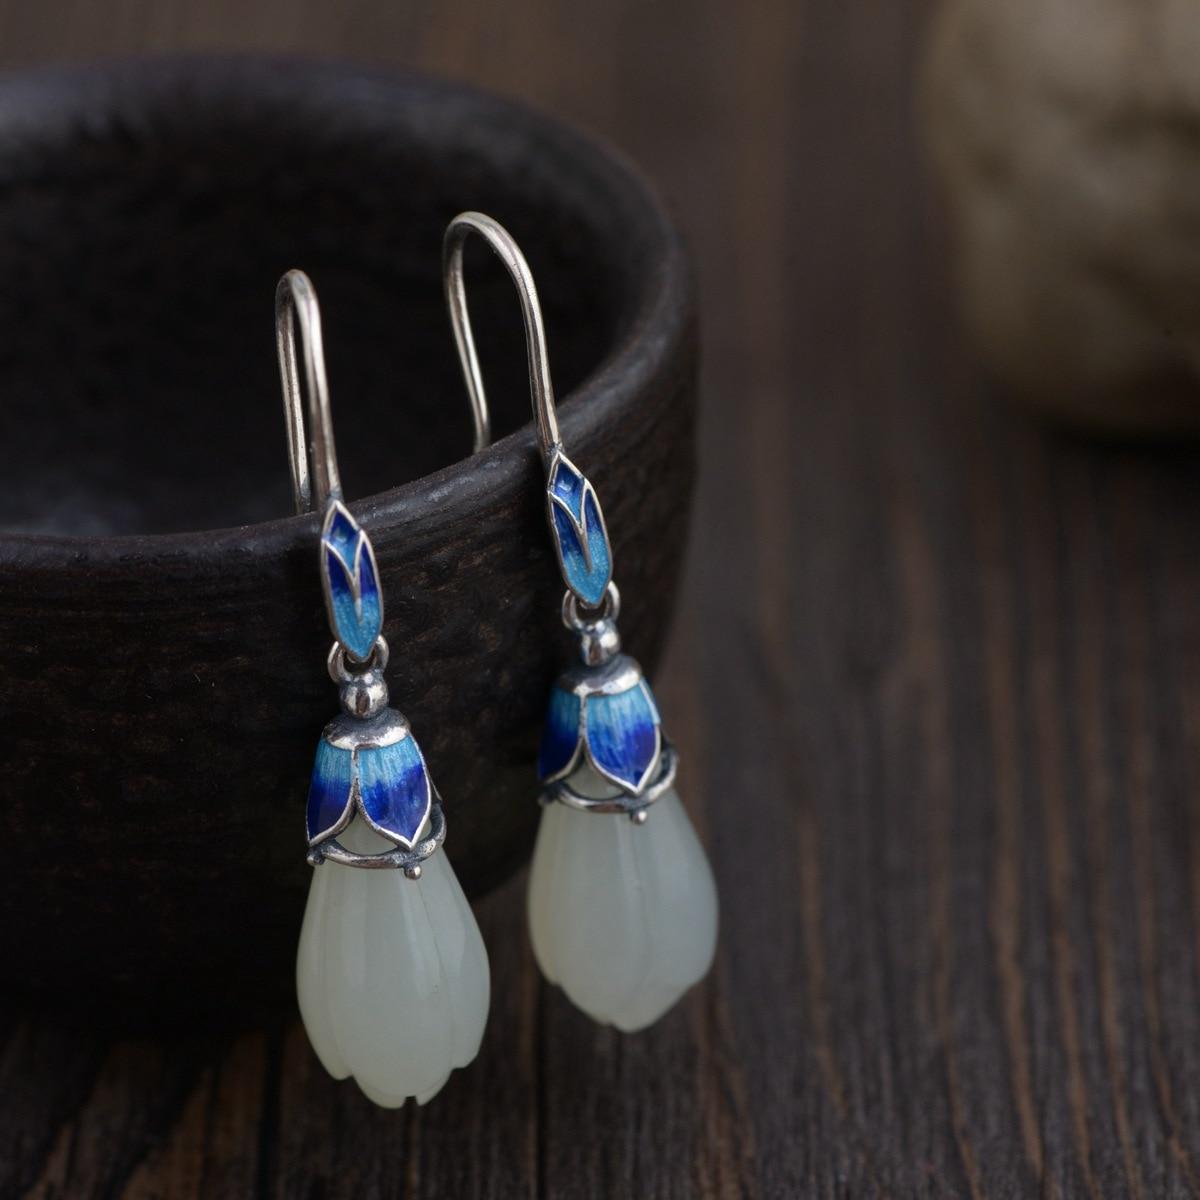 2018 Hot Sale jewelry line 925 silver wholesale Mana burn female fashion Thai silver inlay eardrop of hotan magnolia т в халилова государственная и муниципальная служба